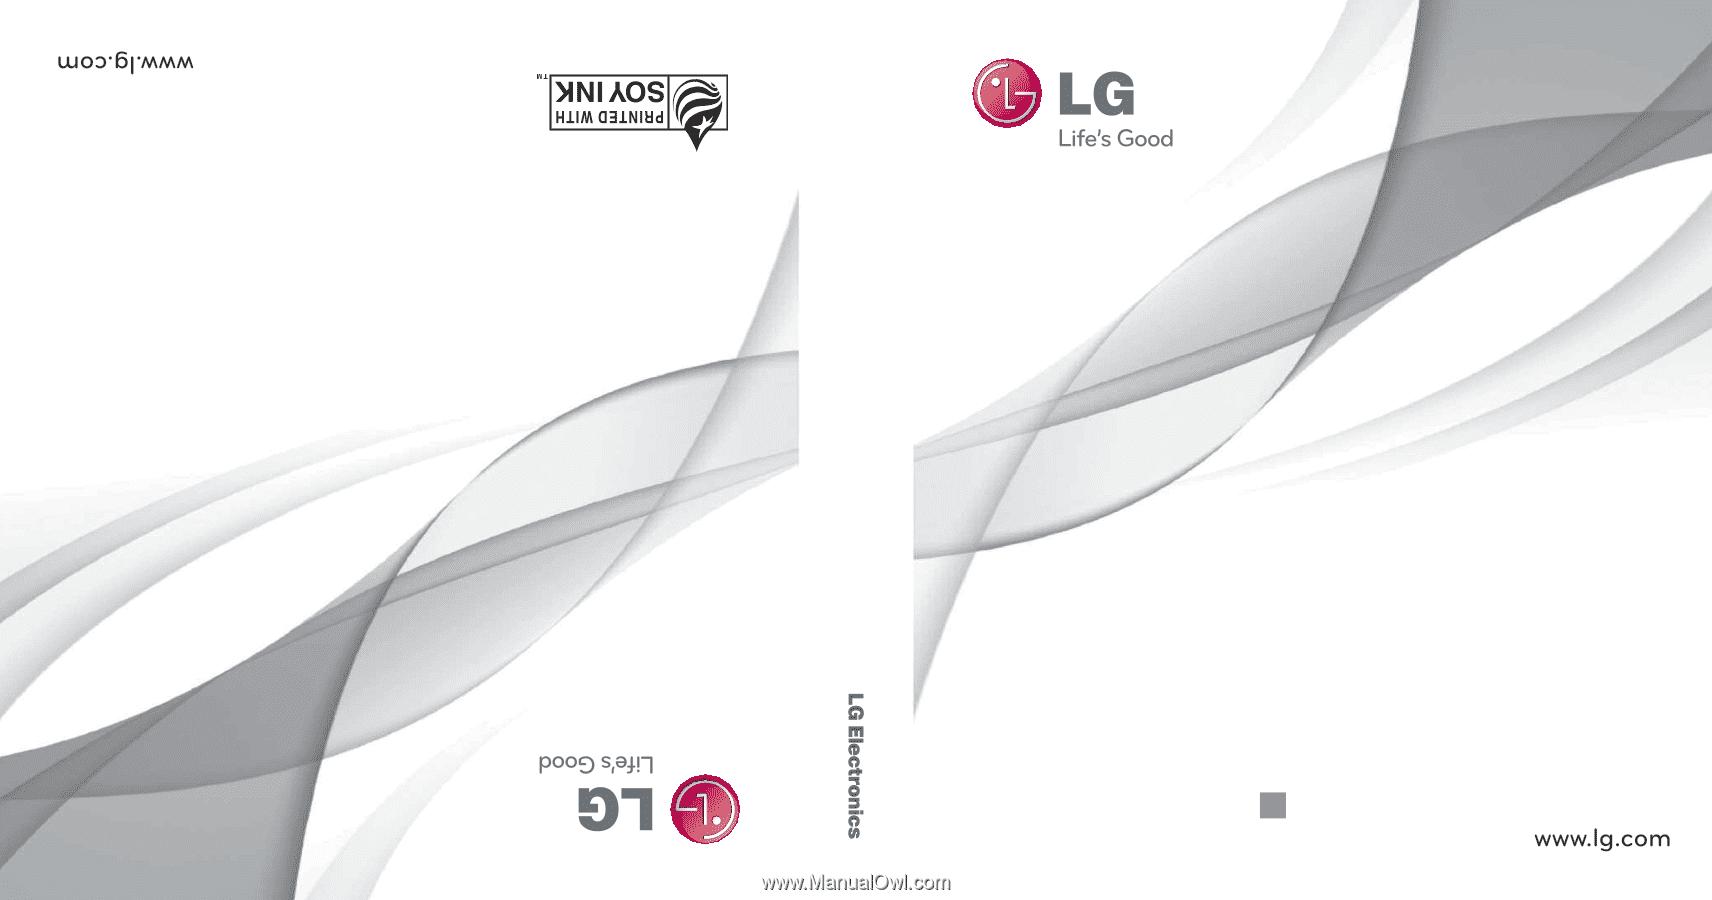 lg lgl55c owners manual english rh manualowl com LG Touch Phone Operating Manual LG Cell Phone Manuals